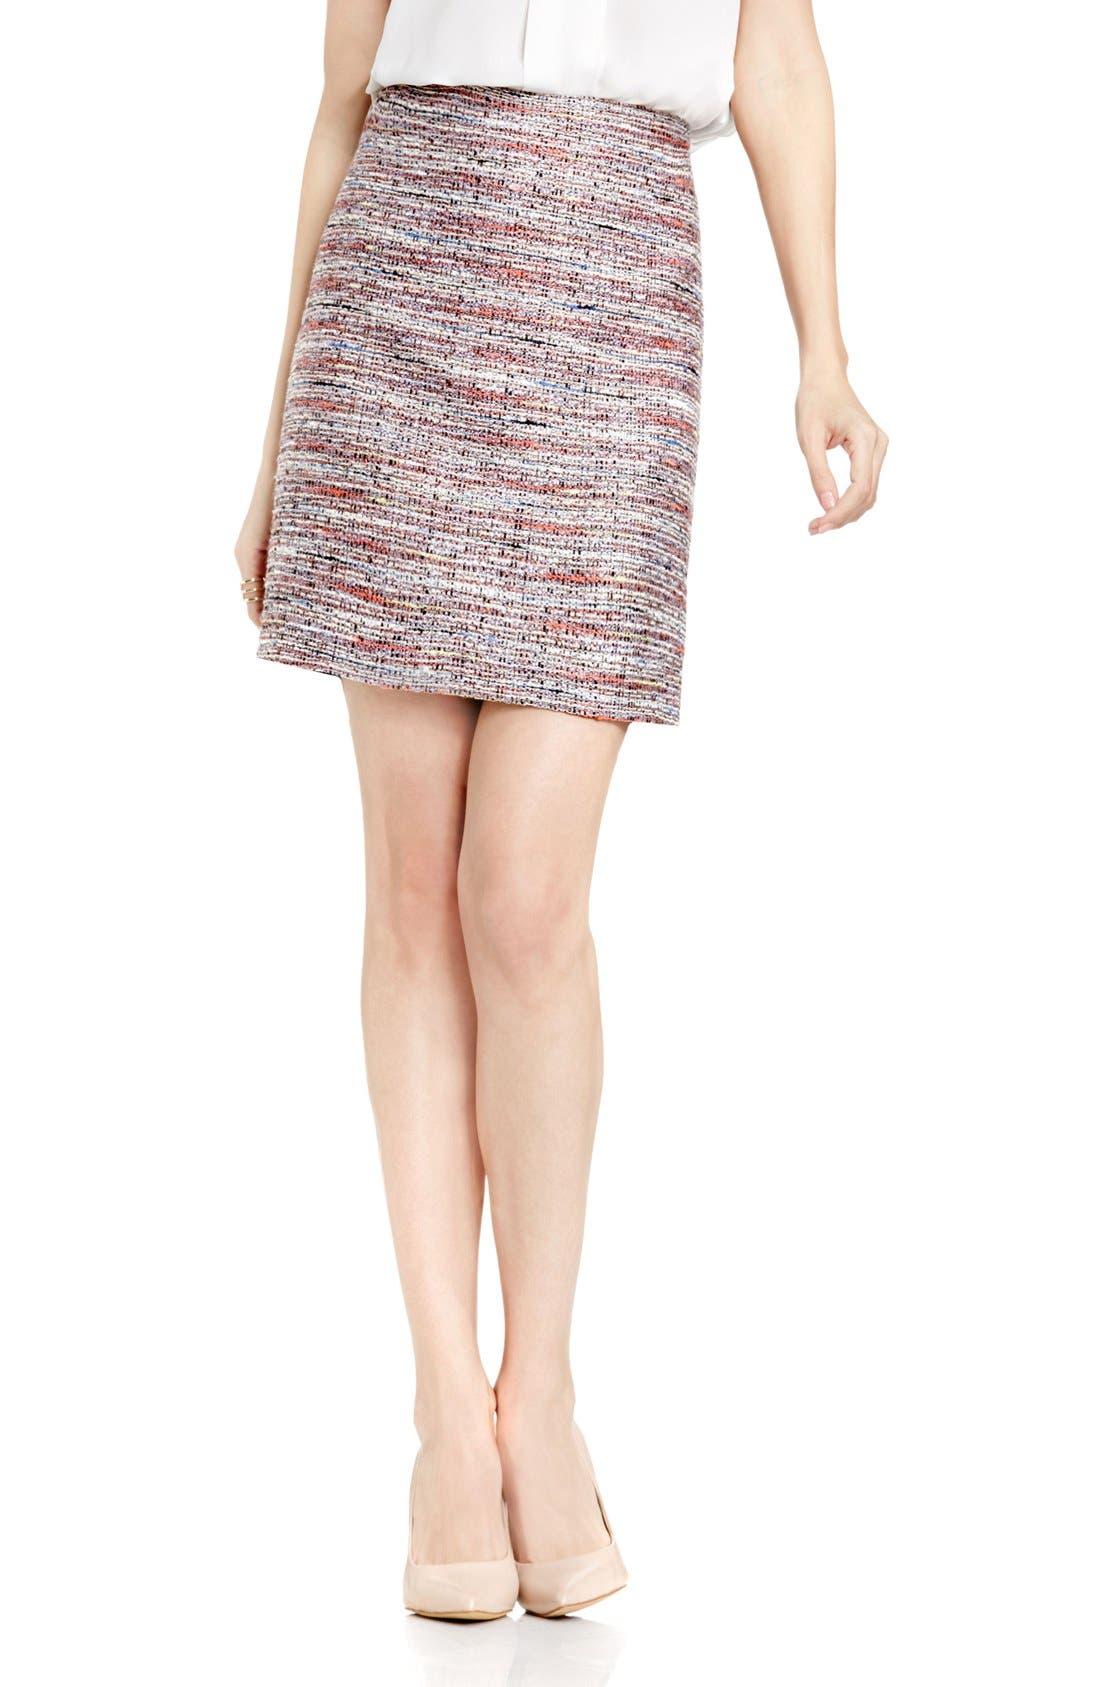 Alternate Image 1 Selected - Vince Camuto Tweed Pencil Skirt (Regular & Petite)